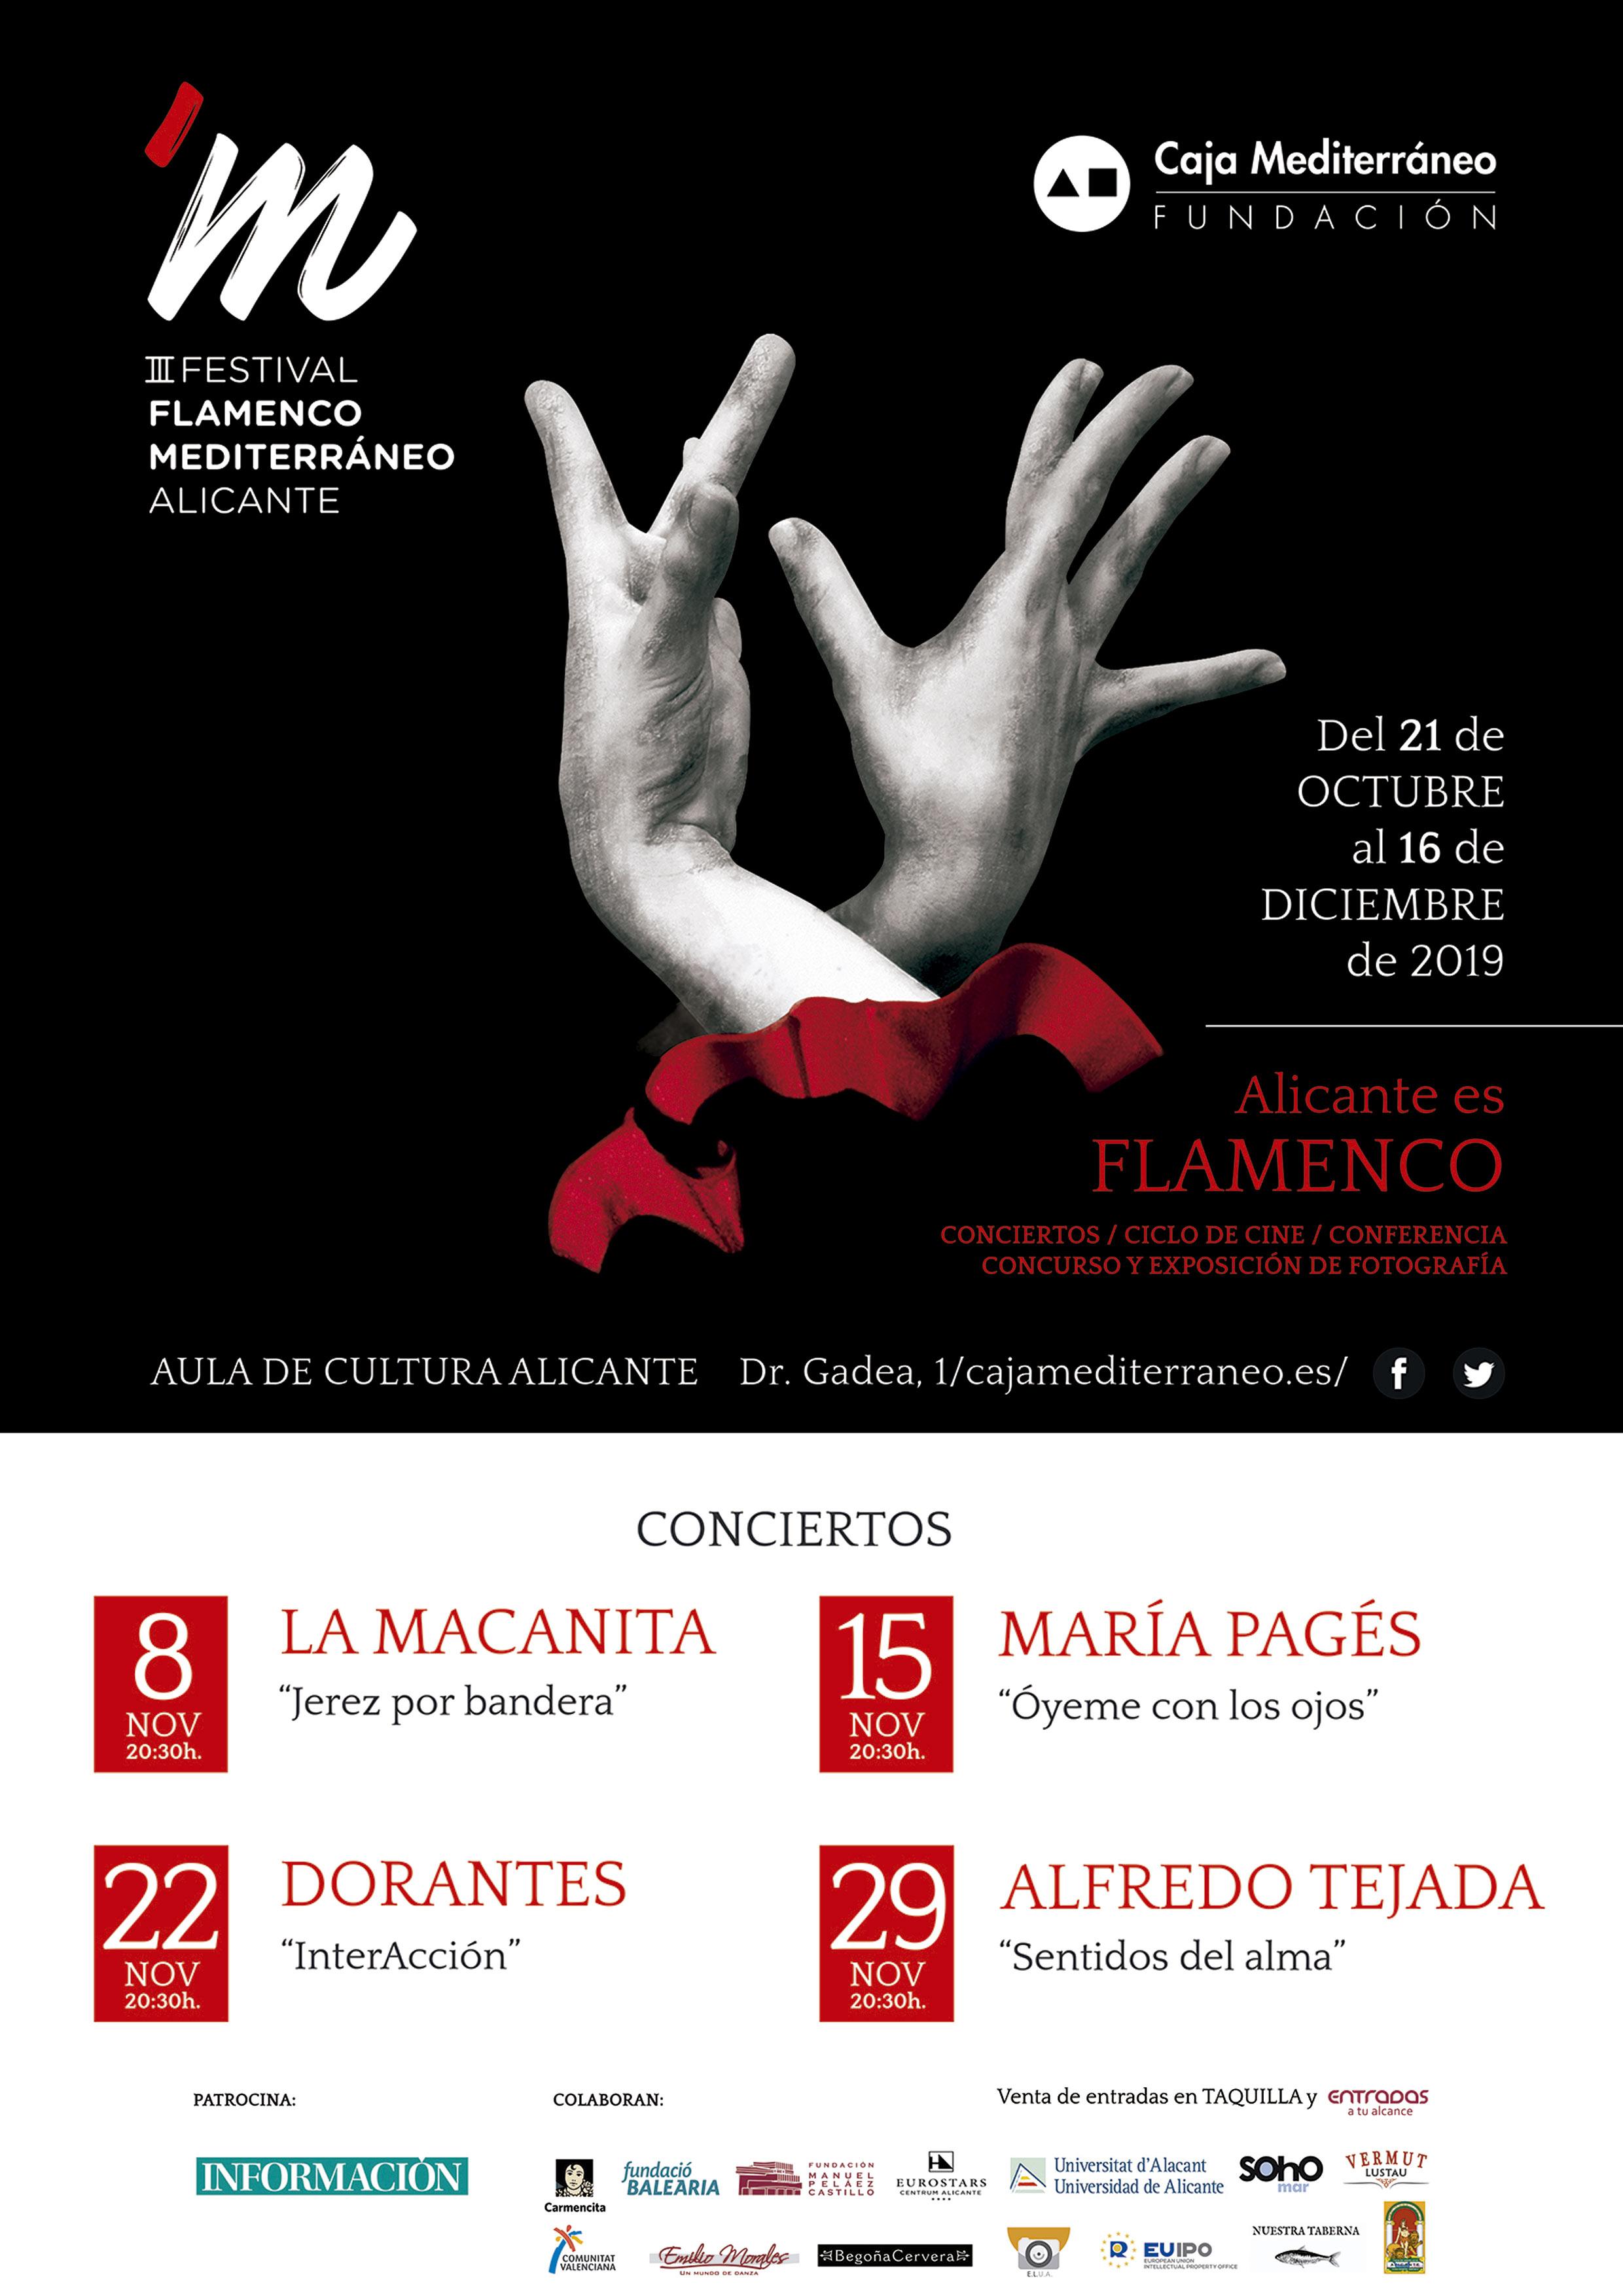 dorantes-iii-festival-flamenco-mediterra